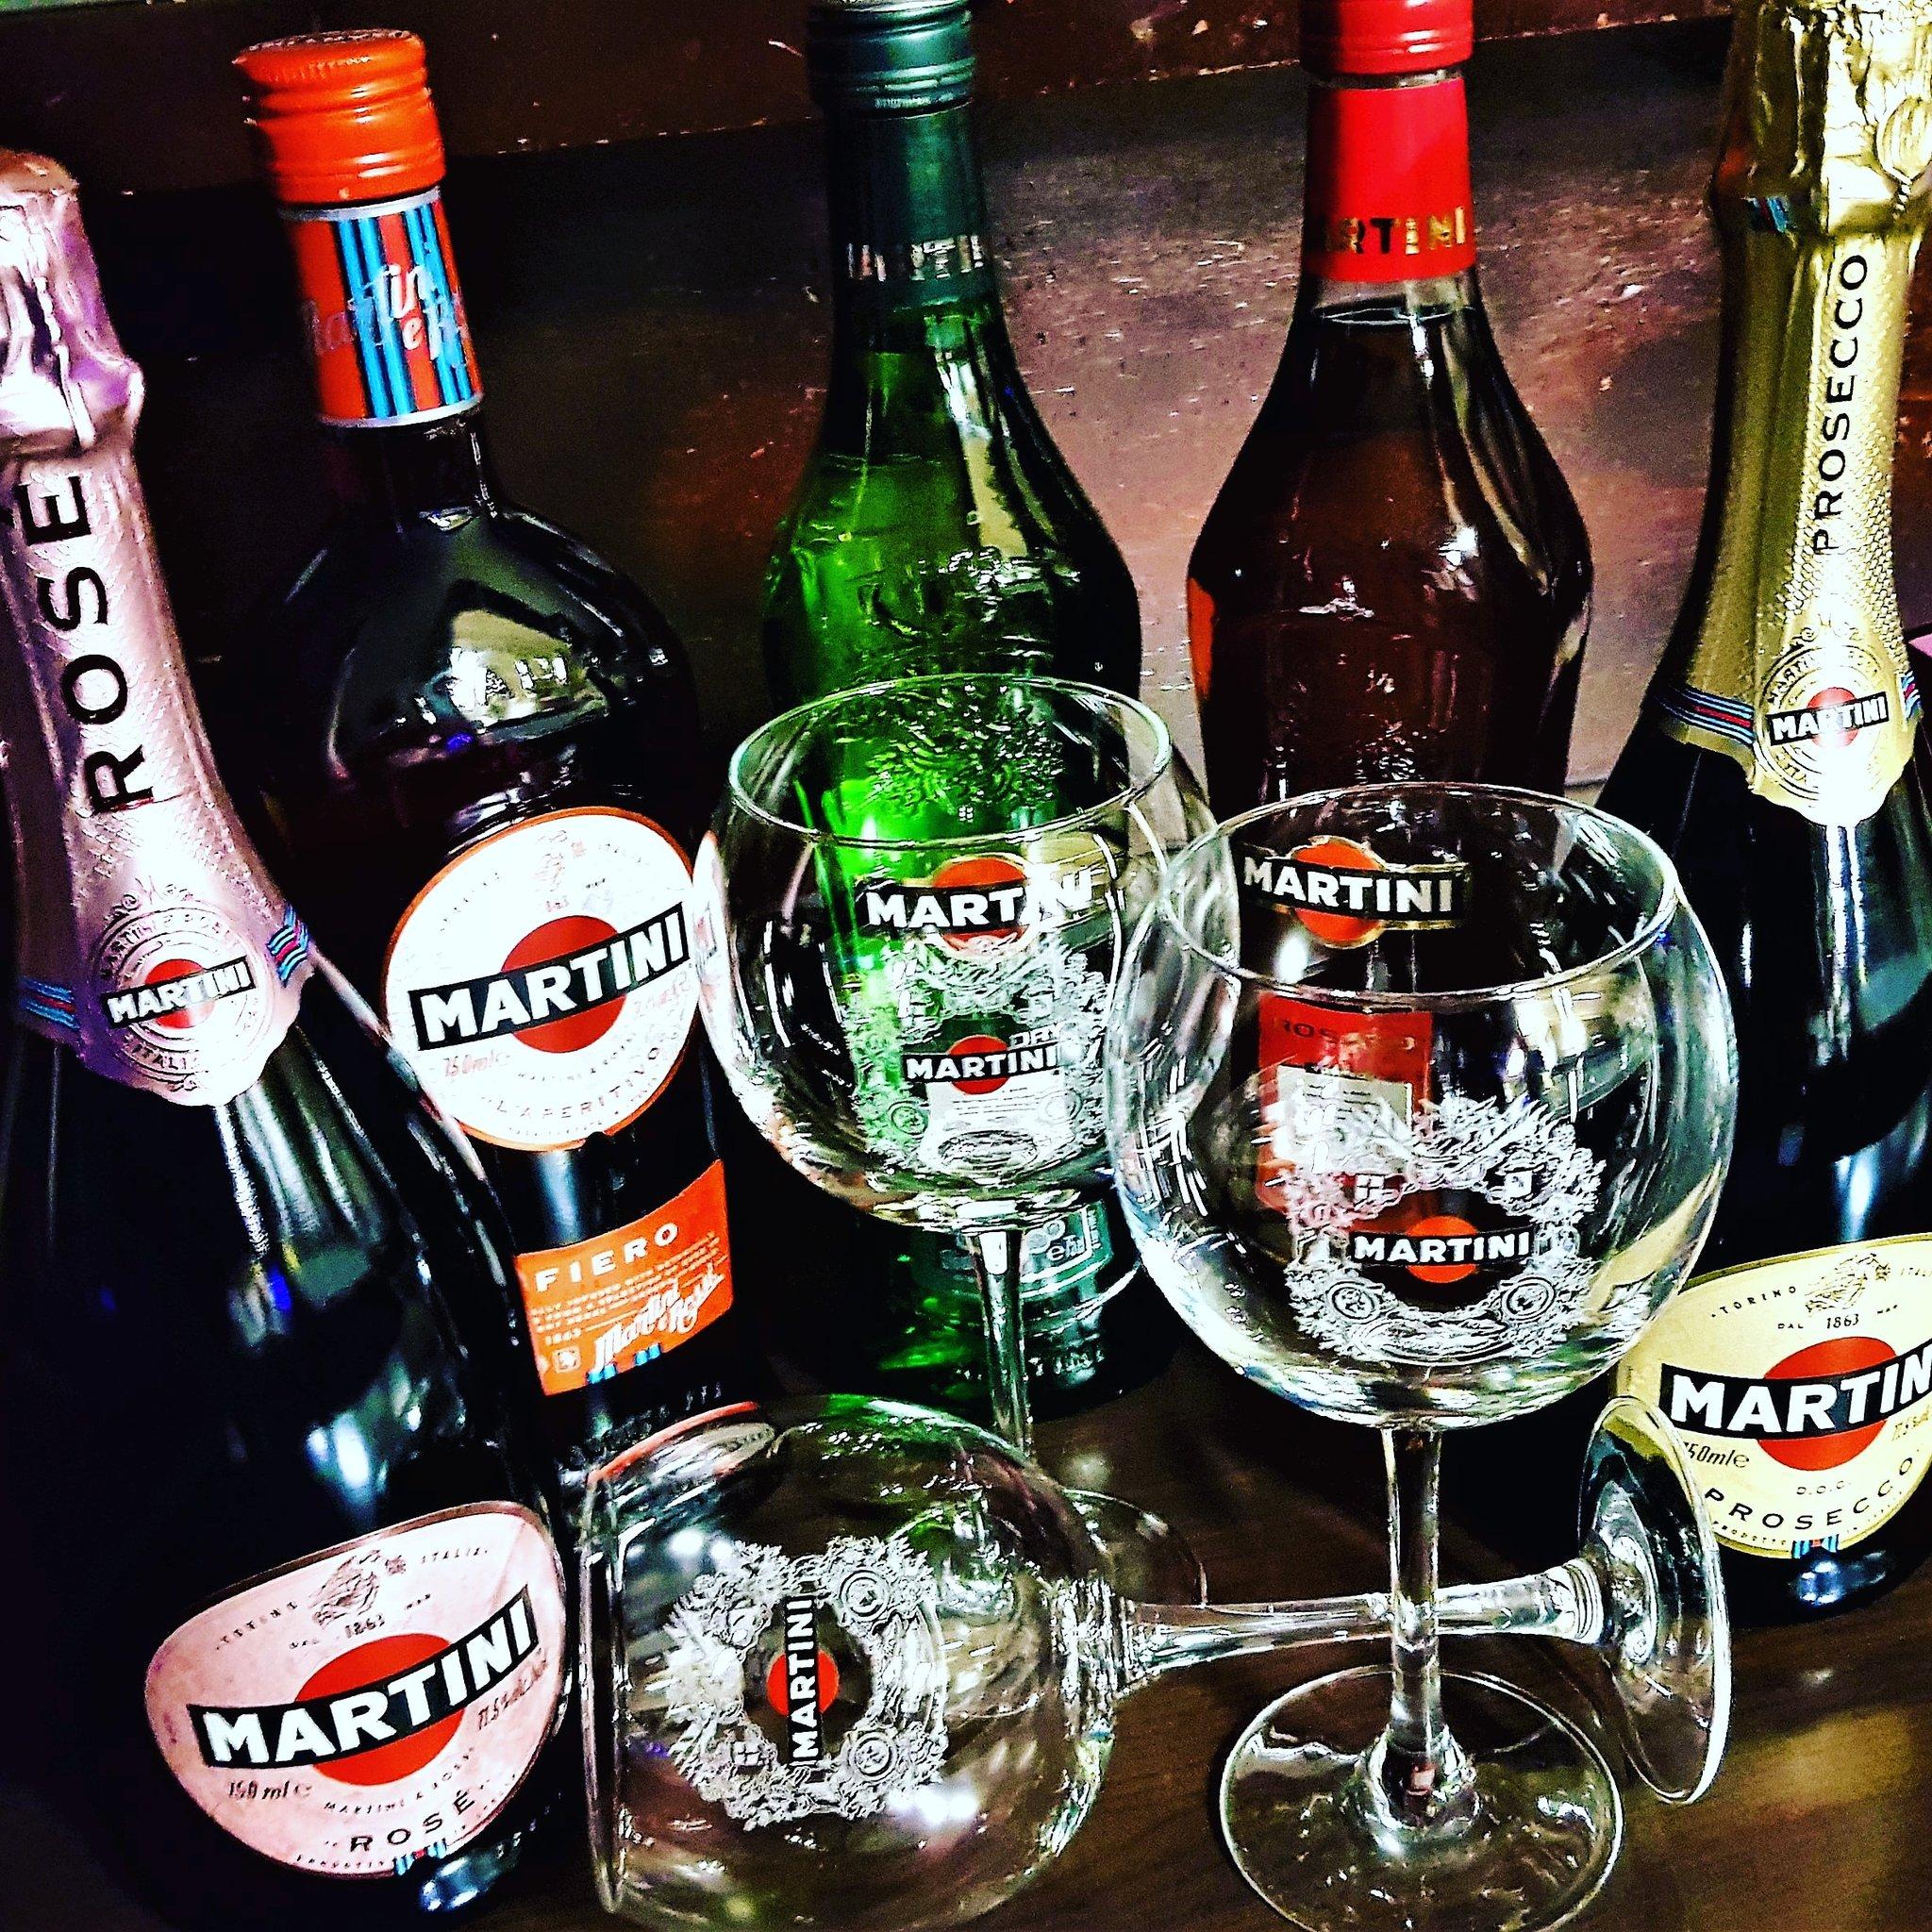 Martini always goes🍸👍🎄🍷🎄#wine #winelover #martini #martinilover #martinifiero #martiniprosecco #prosecco #italy @MacCocktail @thecocktailguru @PBMMW @totc @winewankers @pietrosd @JMiquelWine @Martini_Global @BACARDI https://t.co/460EfVB8bo